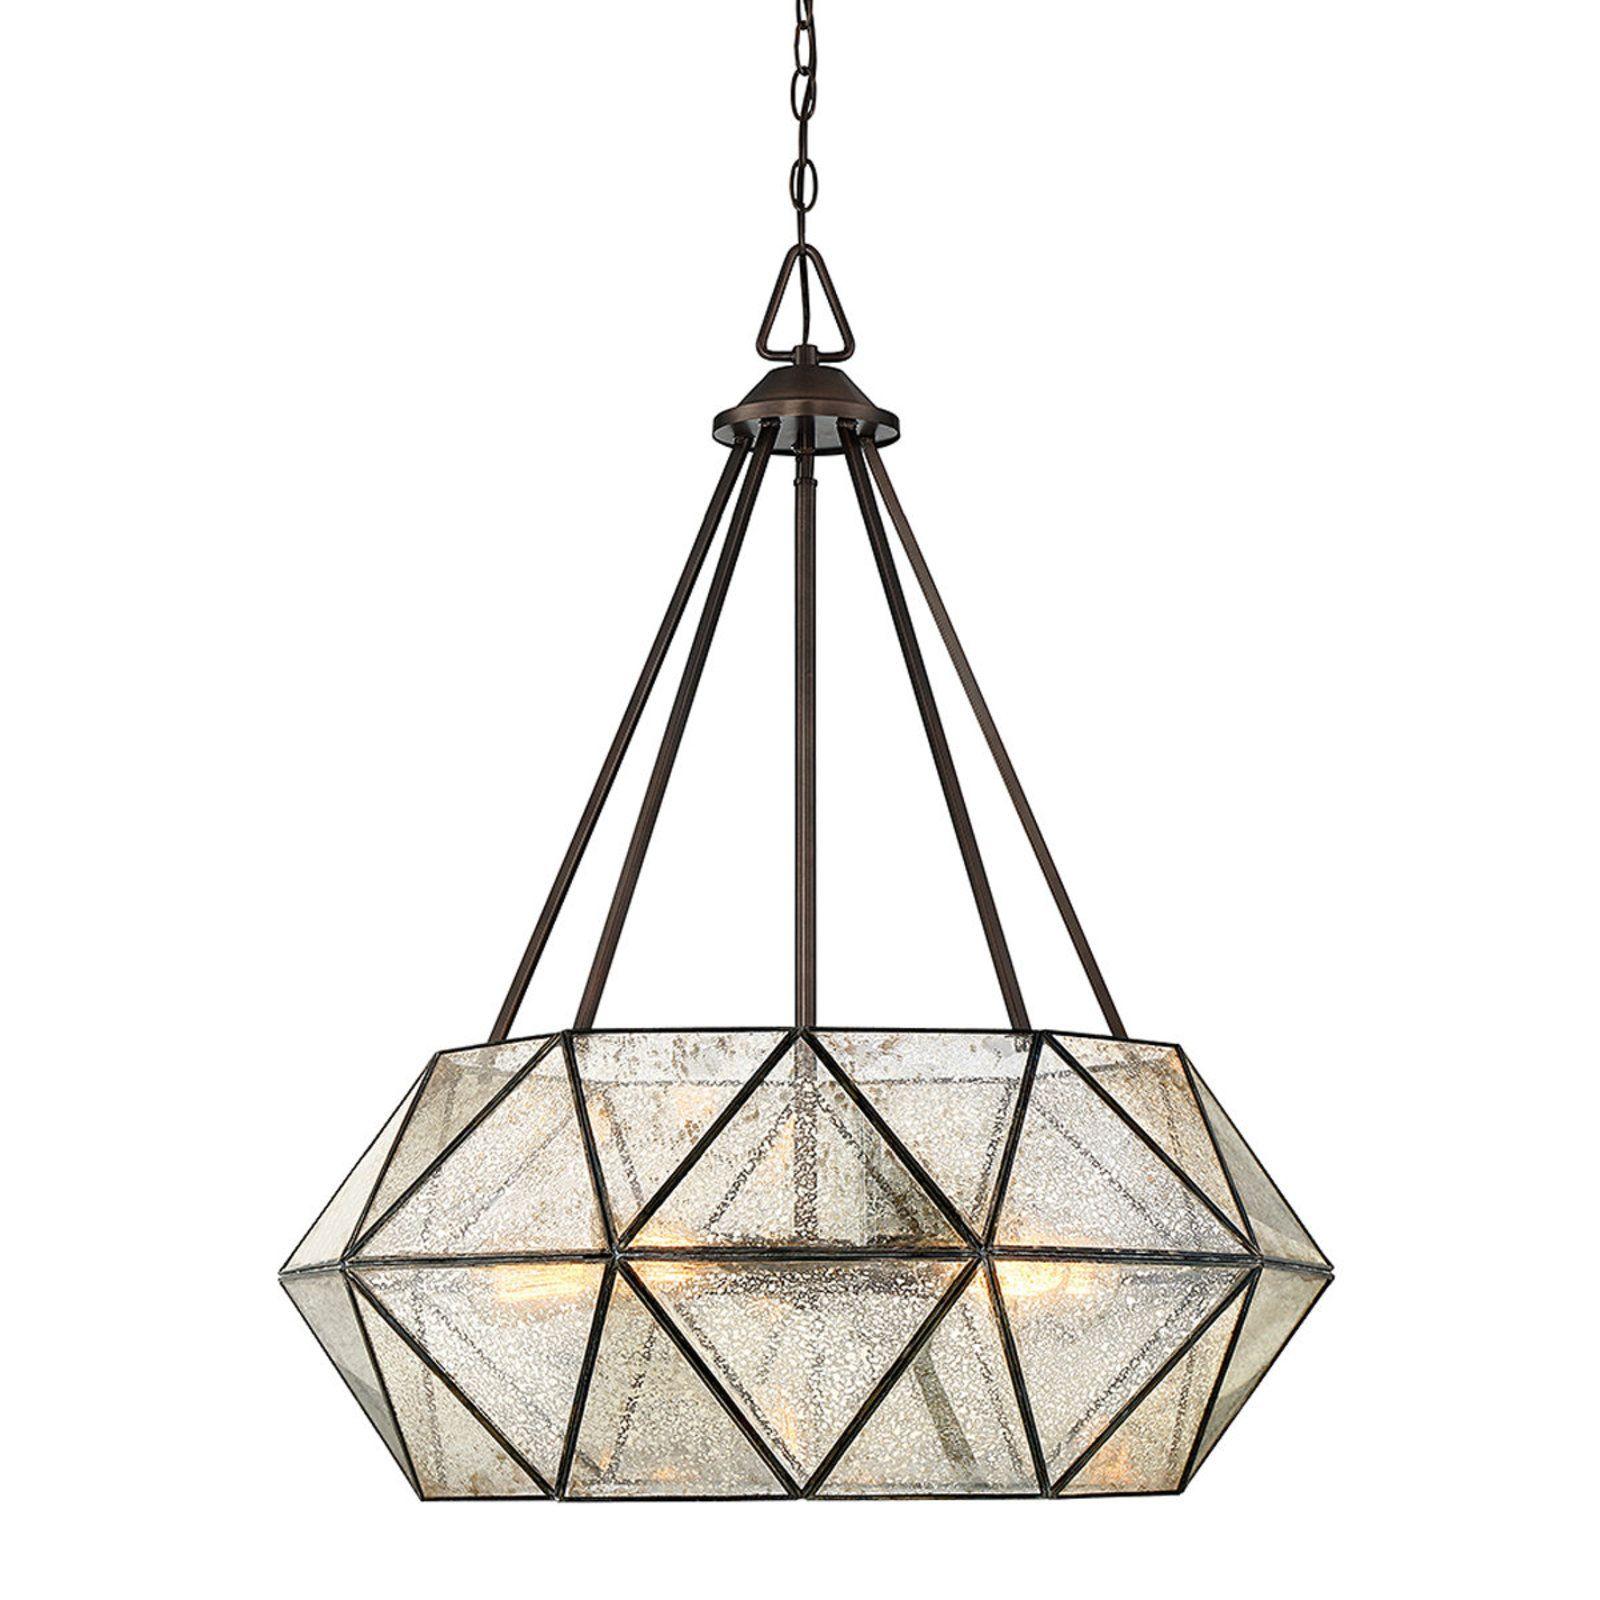 Prism framed mercury glass chandelier 5 light in 2019 middle r